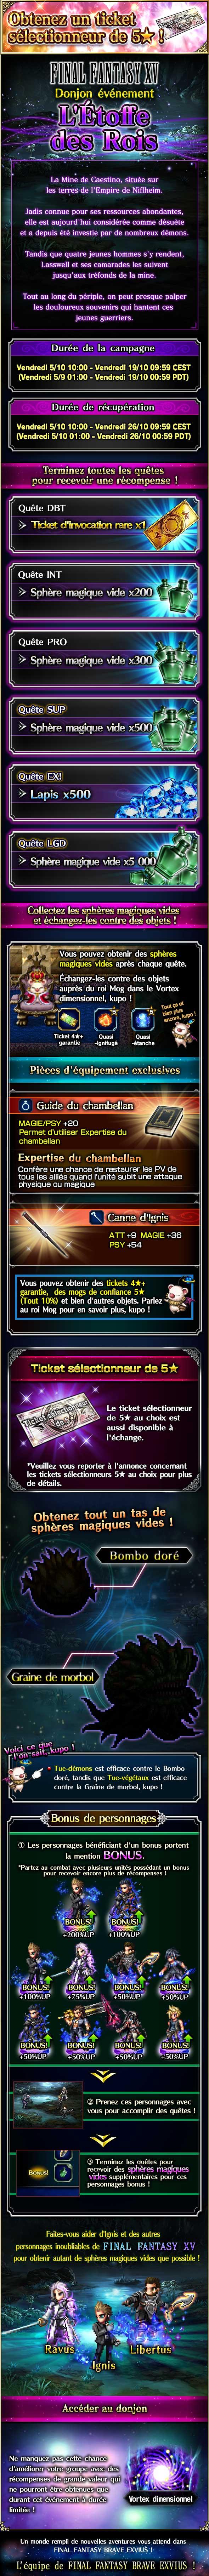 Evénement MK - FFXV - L'Etoffe des Rois - du 05/10/18 au 19/10/18 News_banner_FF15_HeartofaKing